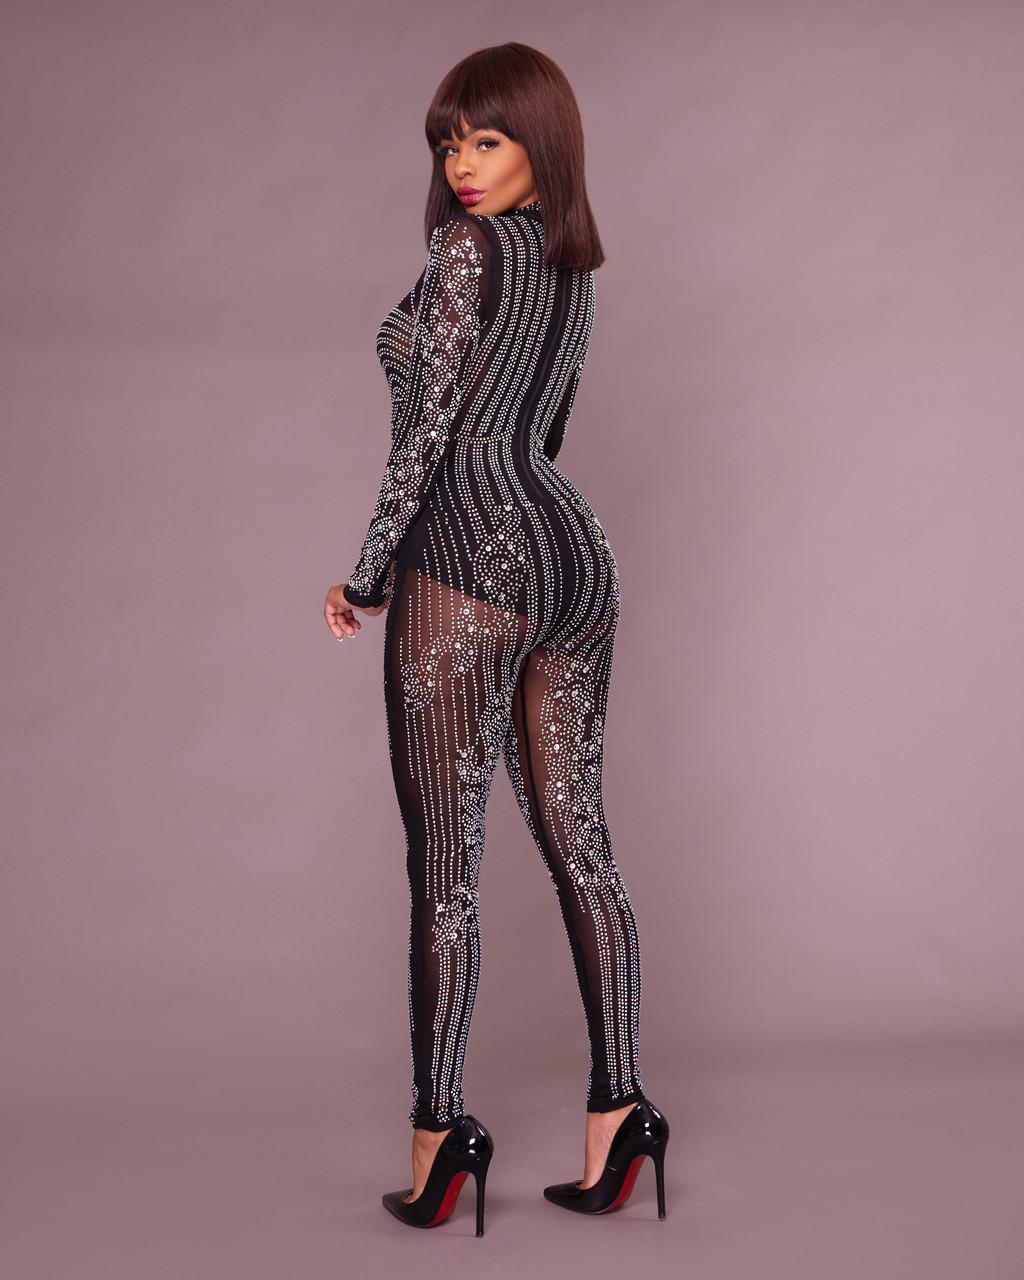 55afc1532ef Yessy Black Rhinestones Semi-Sheer Jumpsuit. Price   100.00. Image 1.  Larger   More Photos